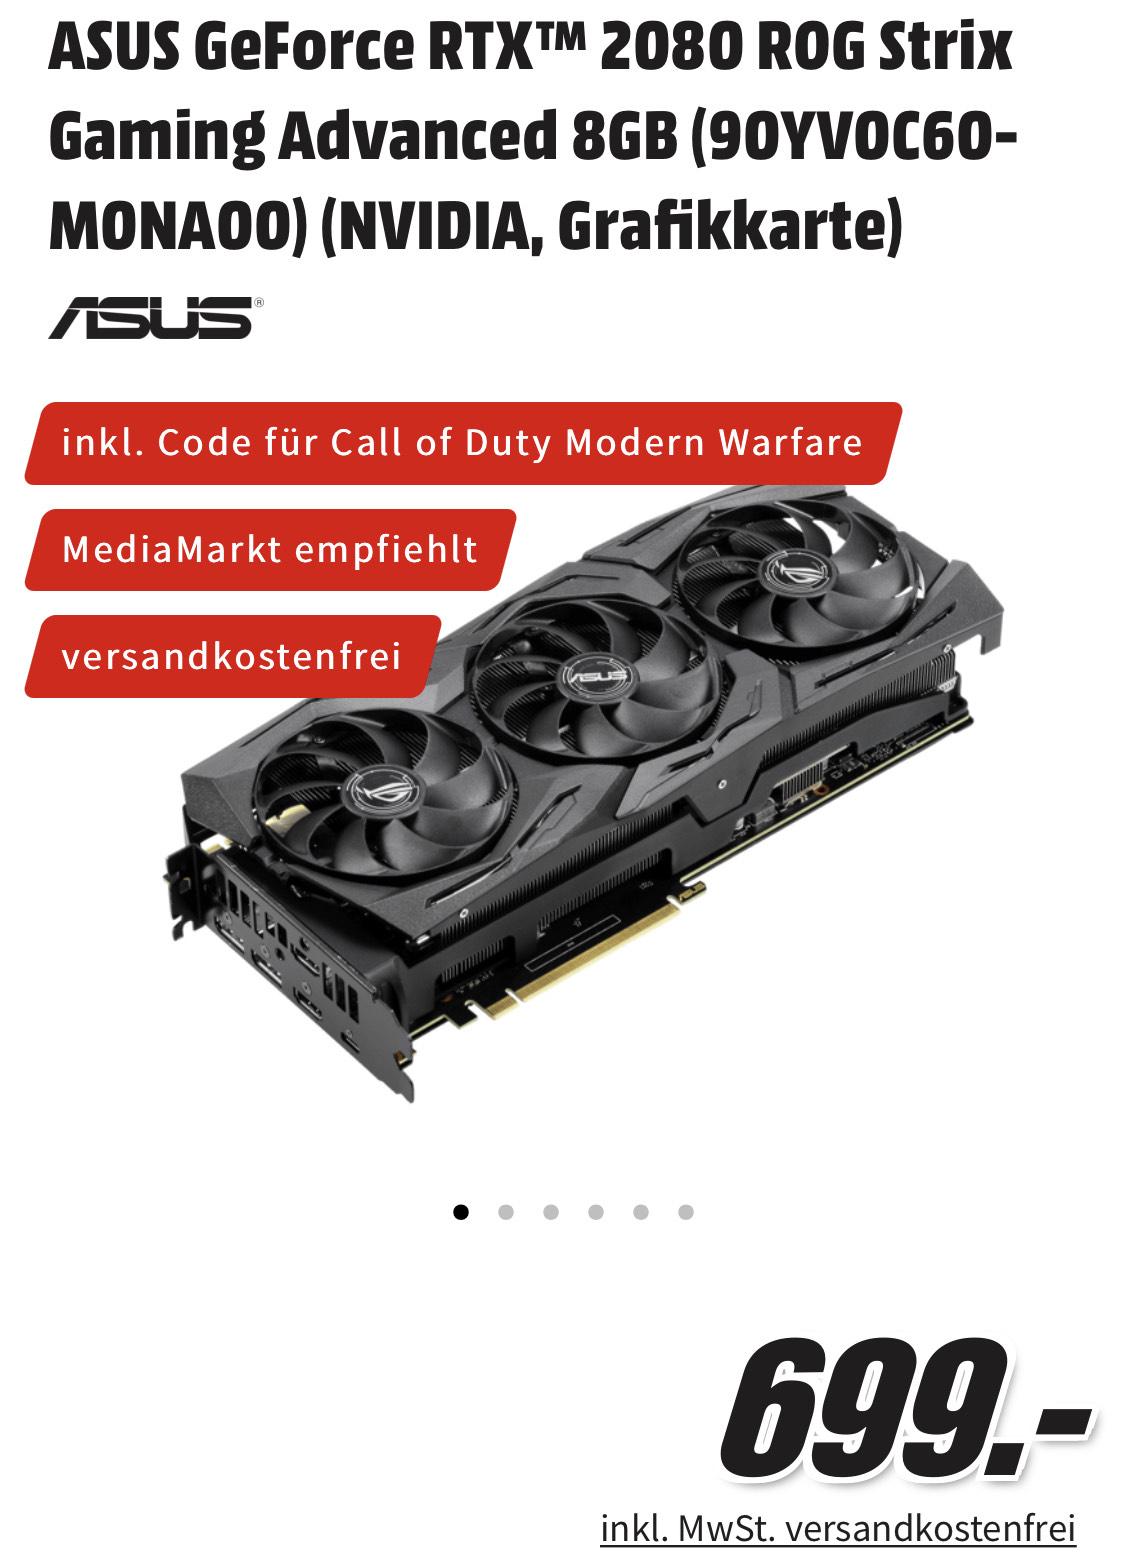 Nvidia Asus RTX 2080 Strix Advanced 699€ bei Media Markt/Saturn inkl CoD Code